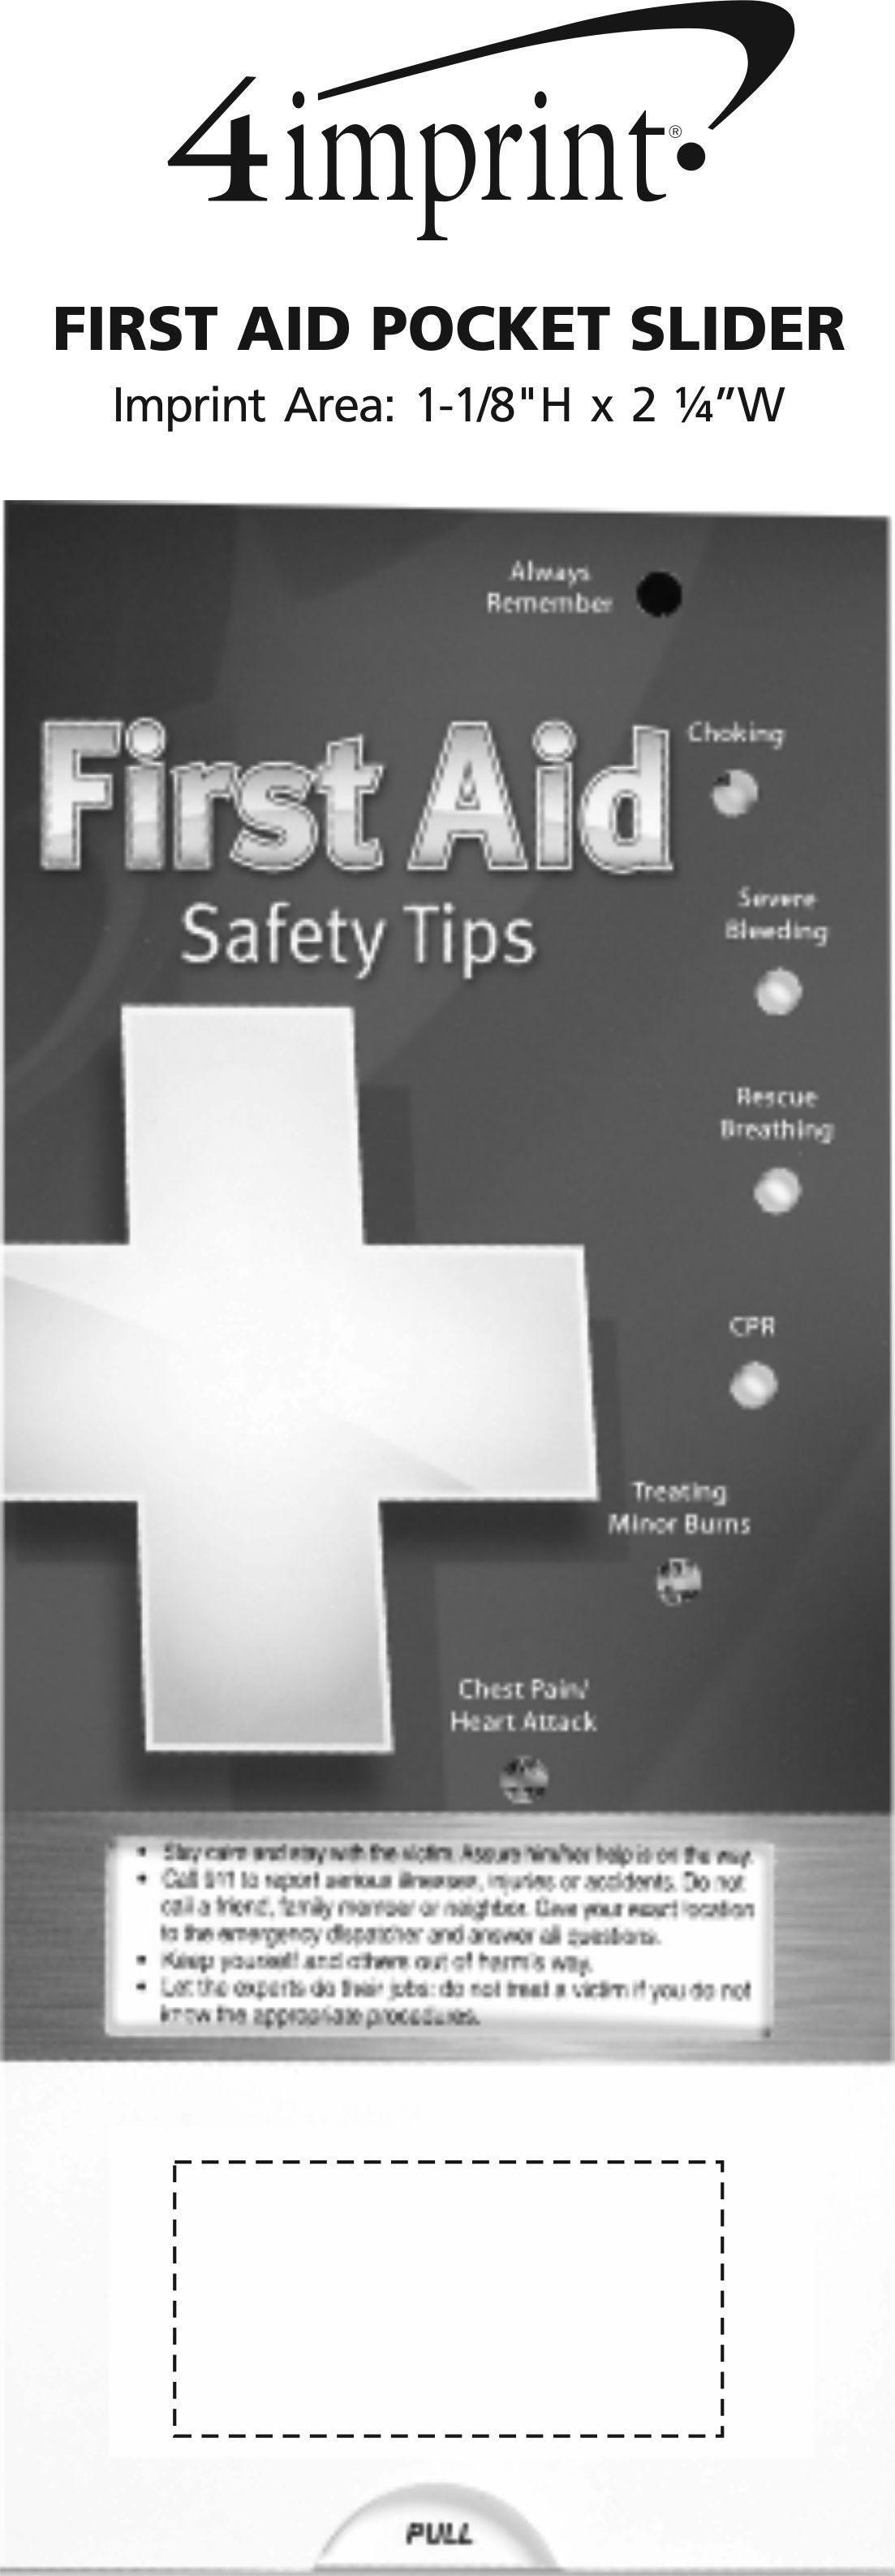 Imprint Area of First Aid Pocket Slider